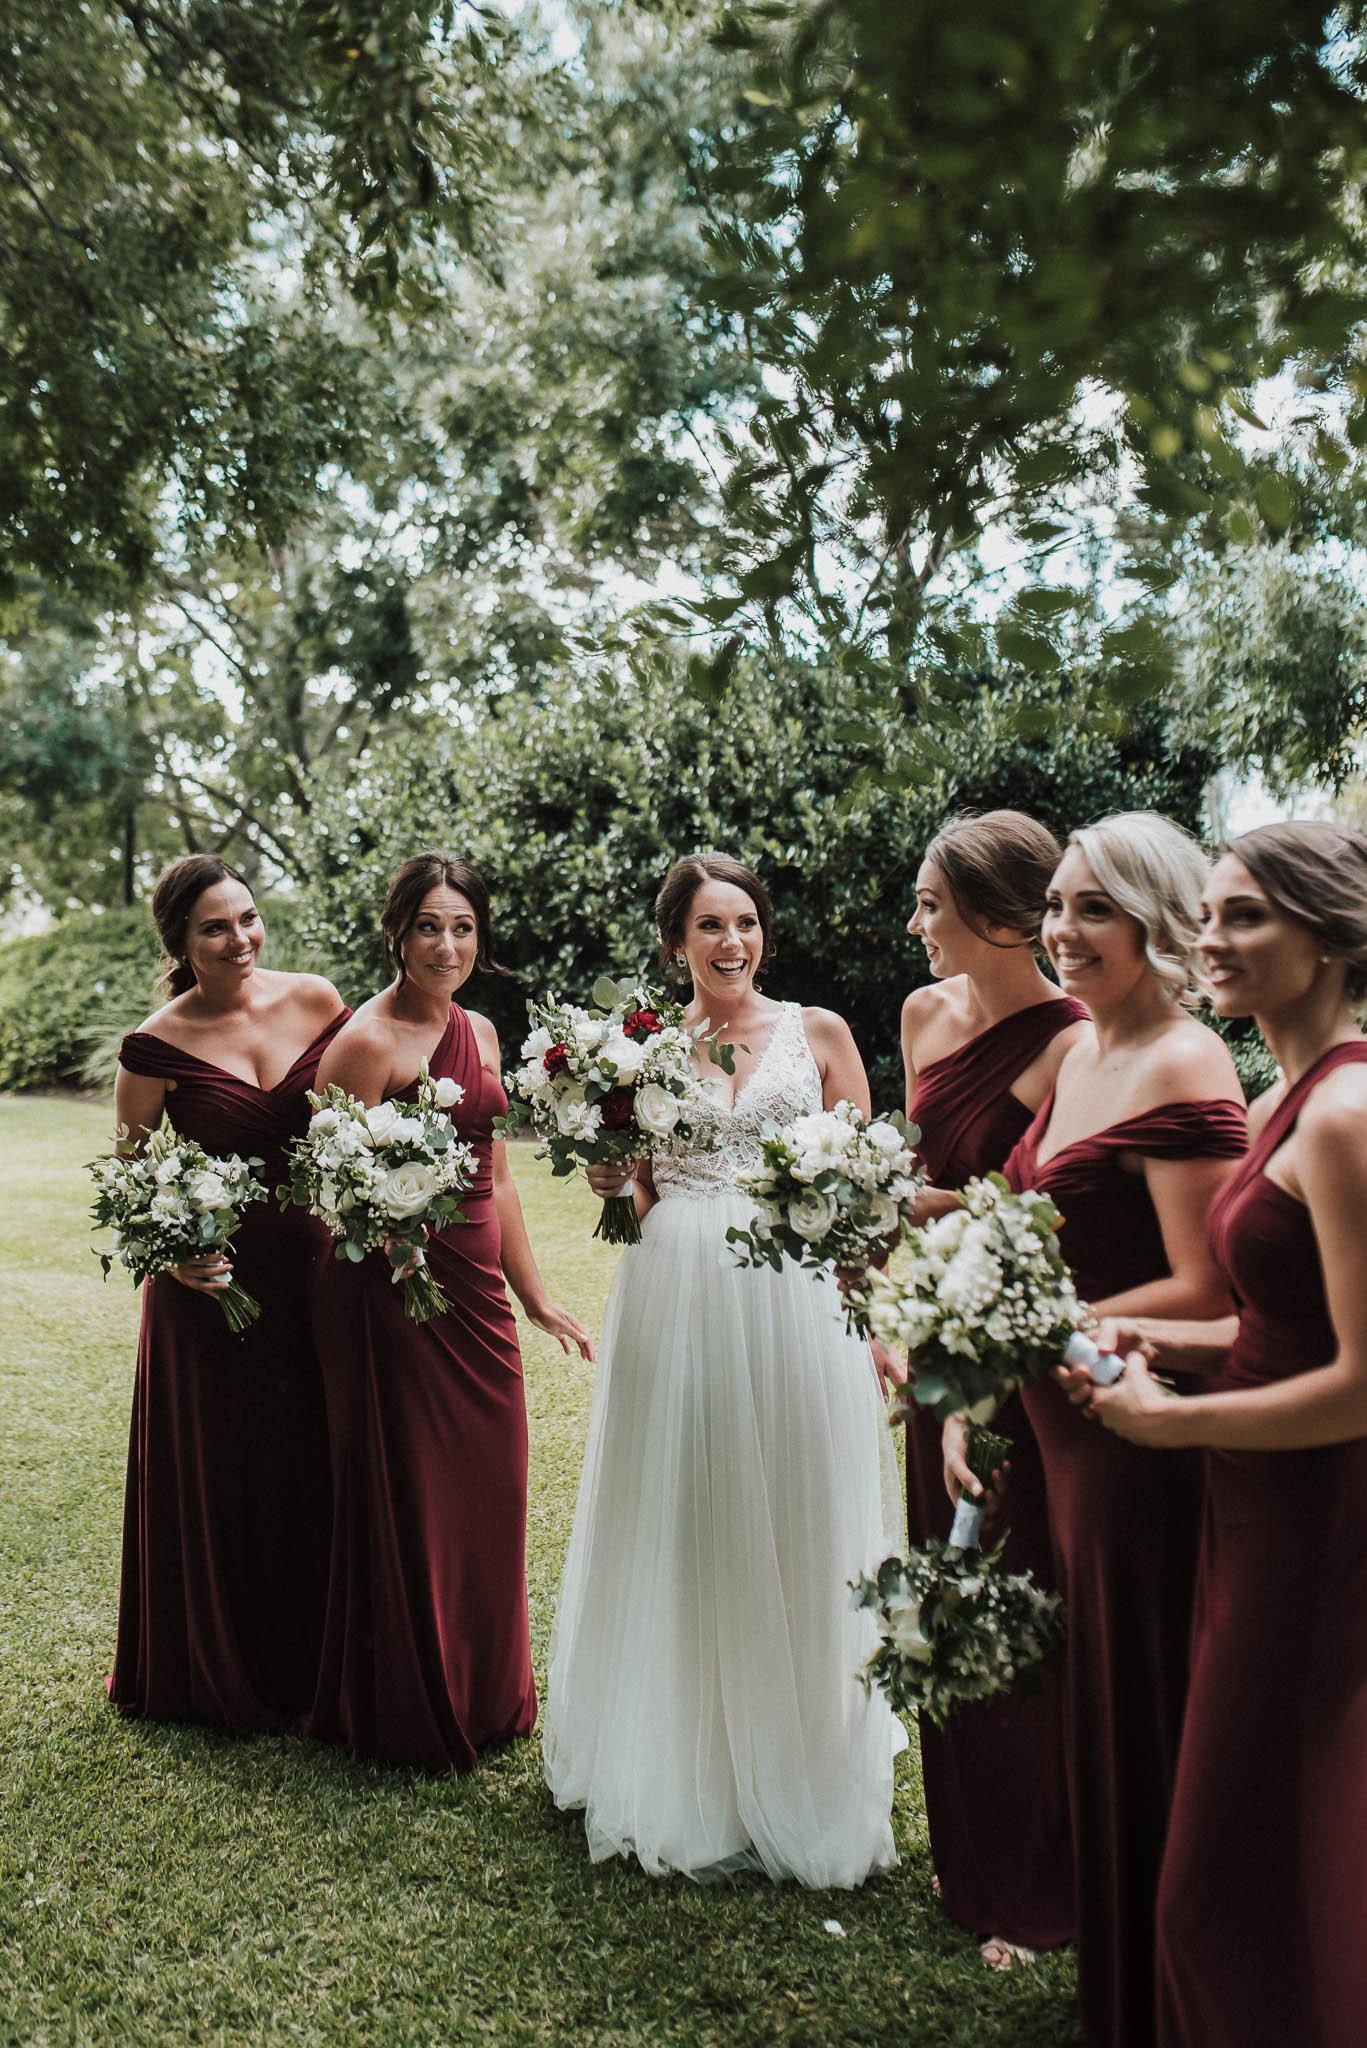 MECURE-RESORT-WEDDING-KING-WEB-252.jpg